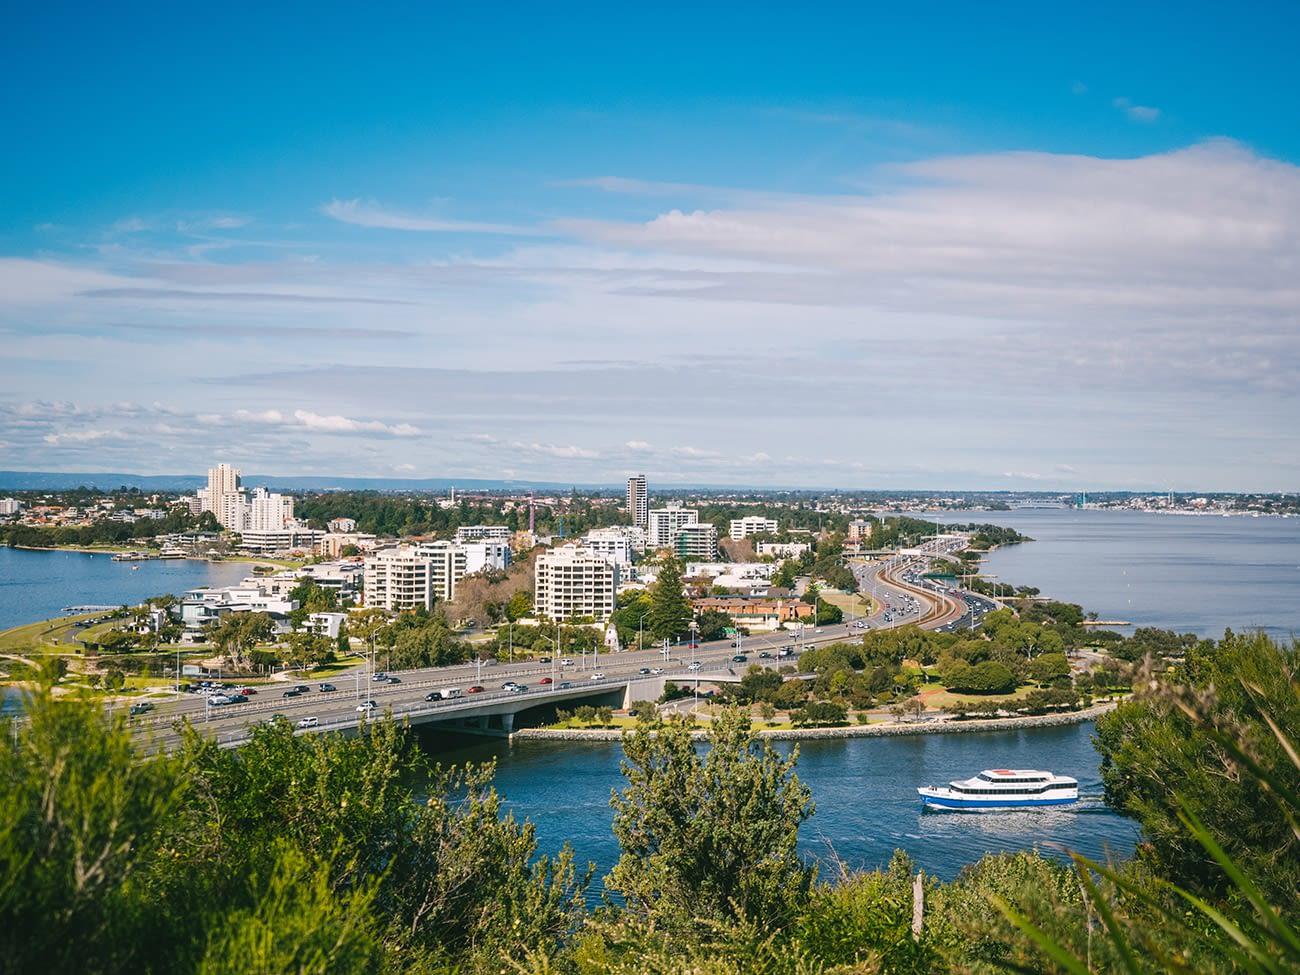 Australia - Perth - Kings Park and Botanic Garden View 2